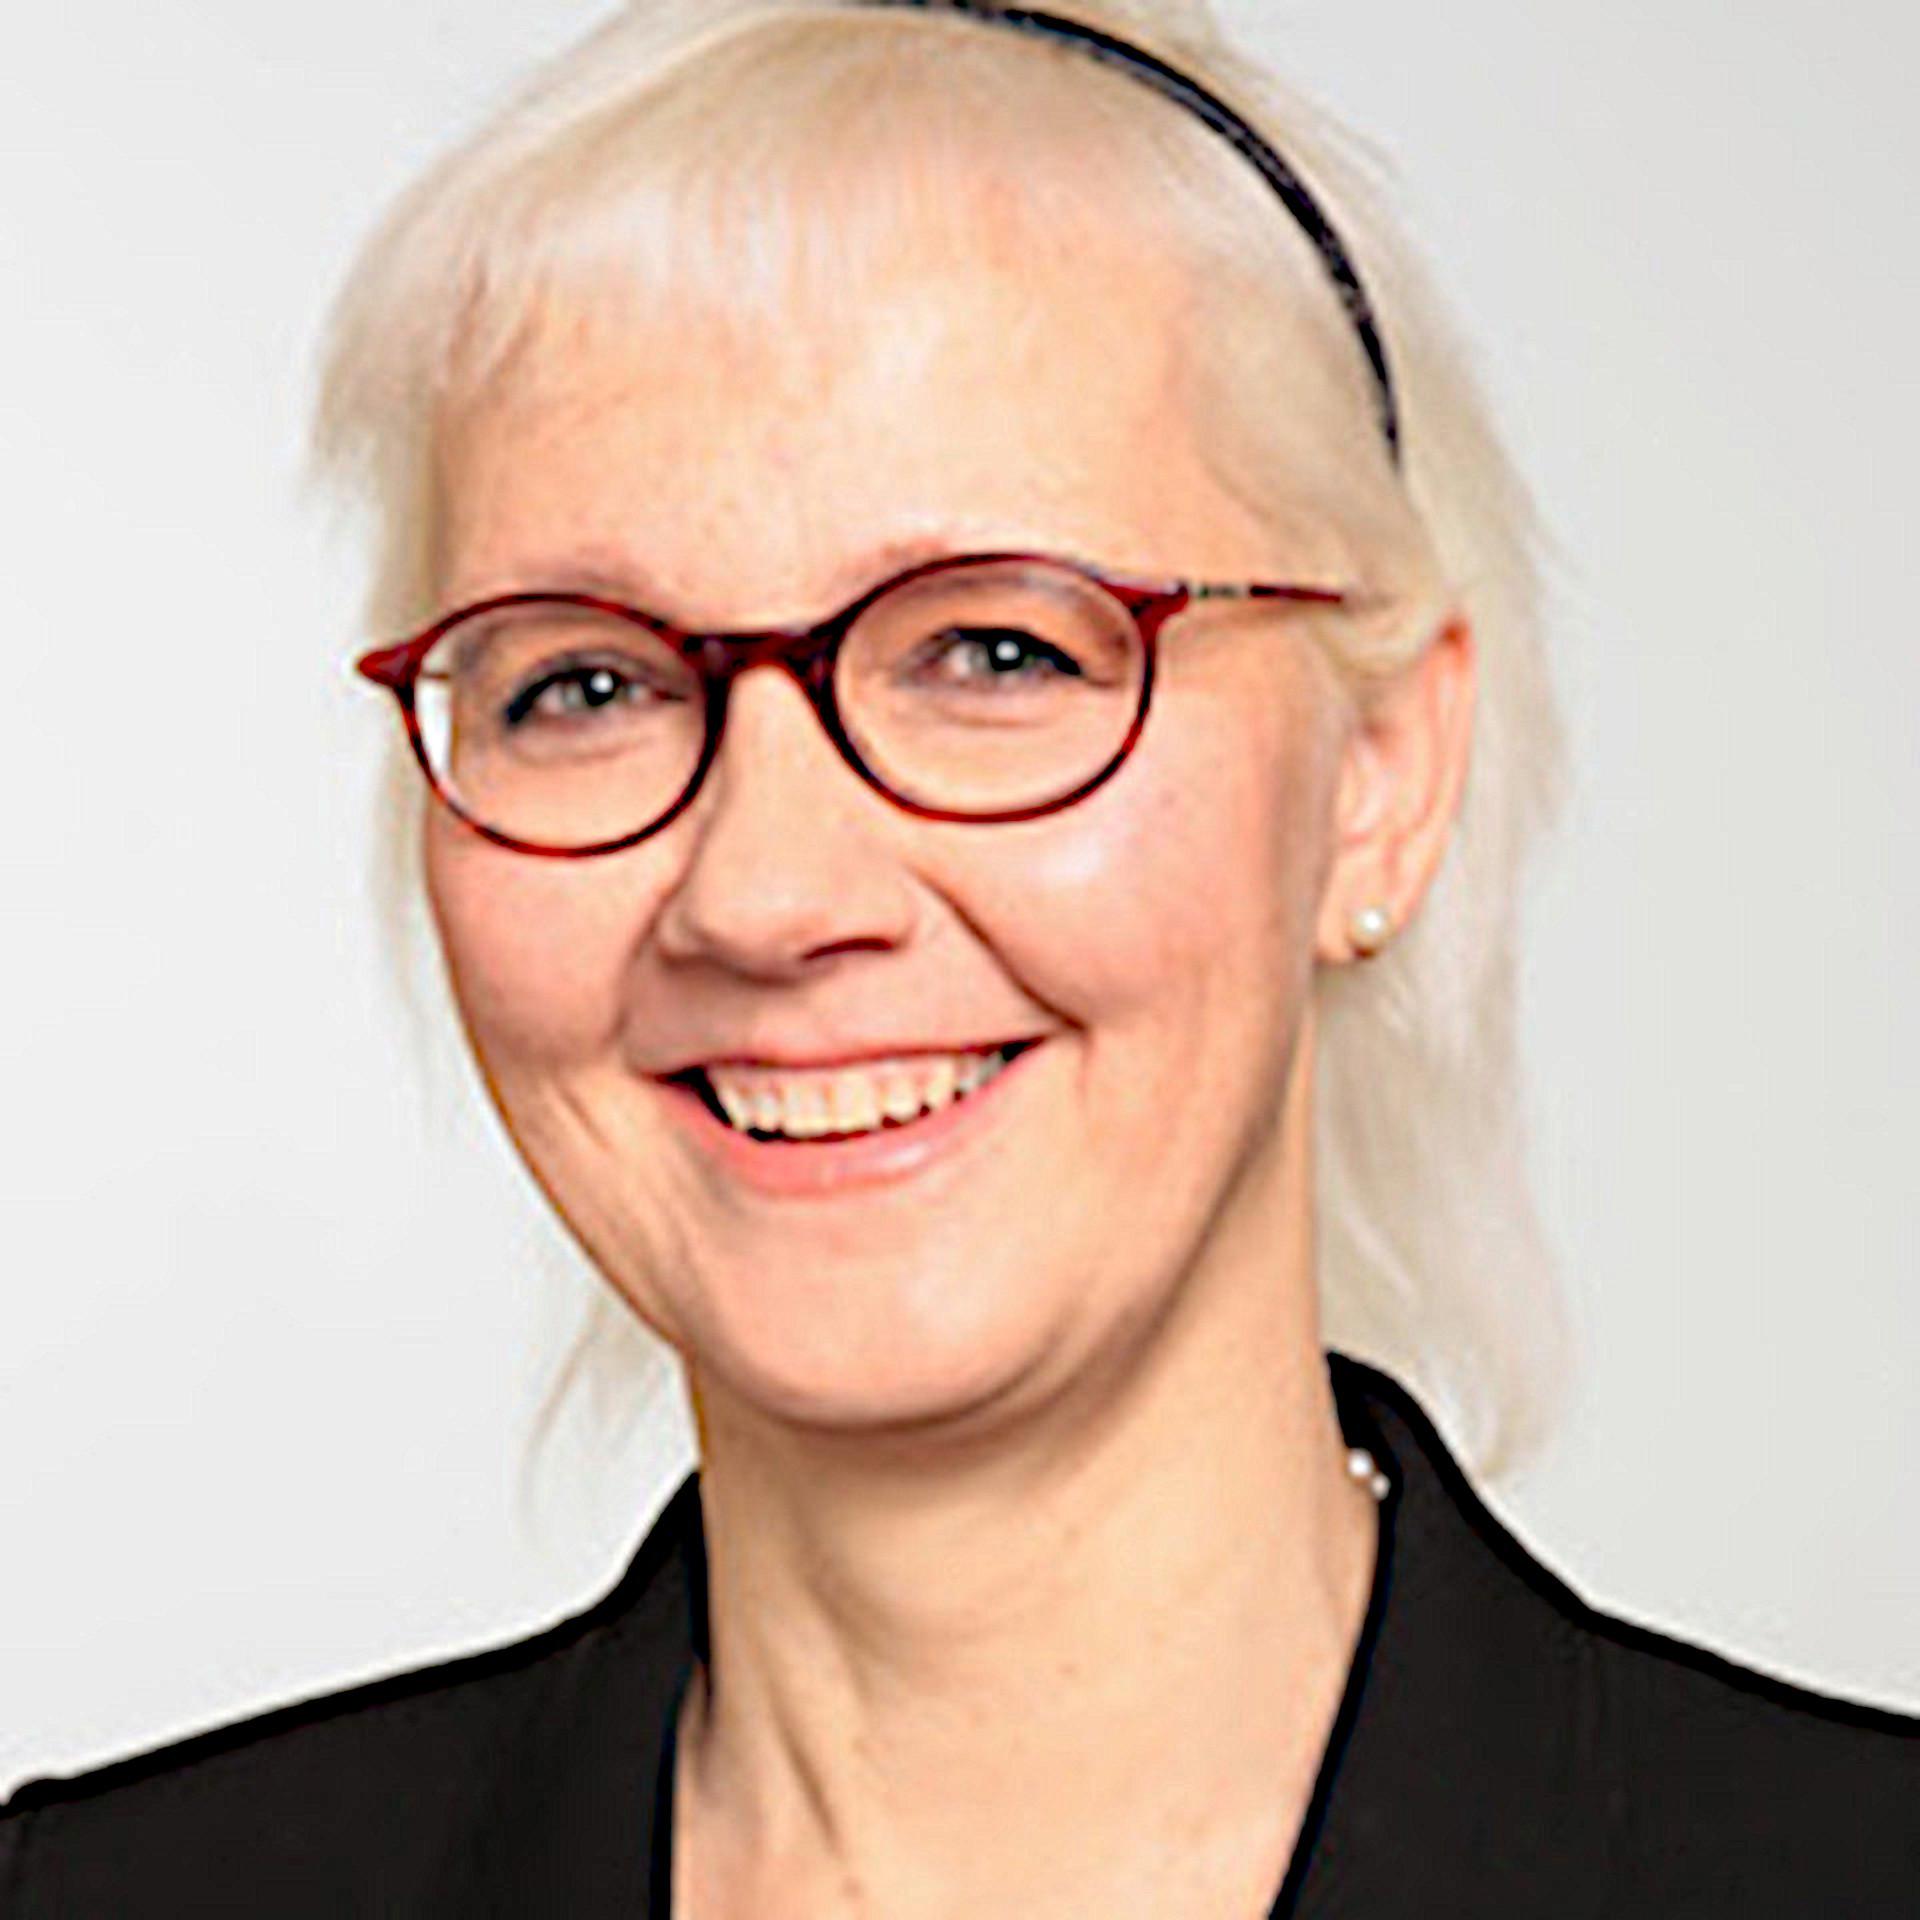 Pfarrerin Dr. Cornelia Jager